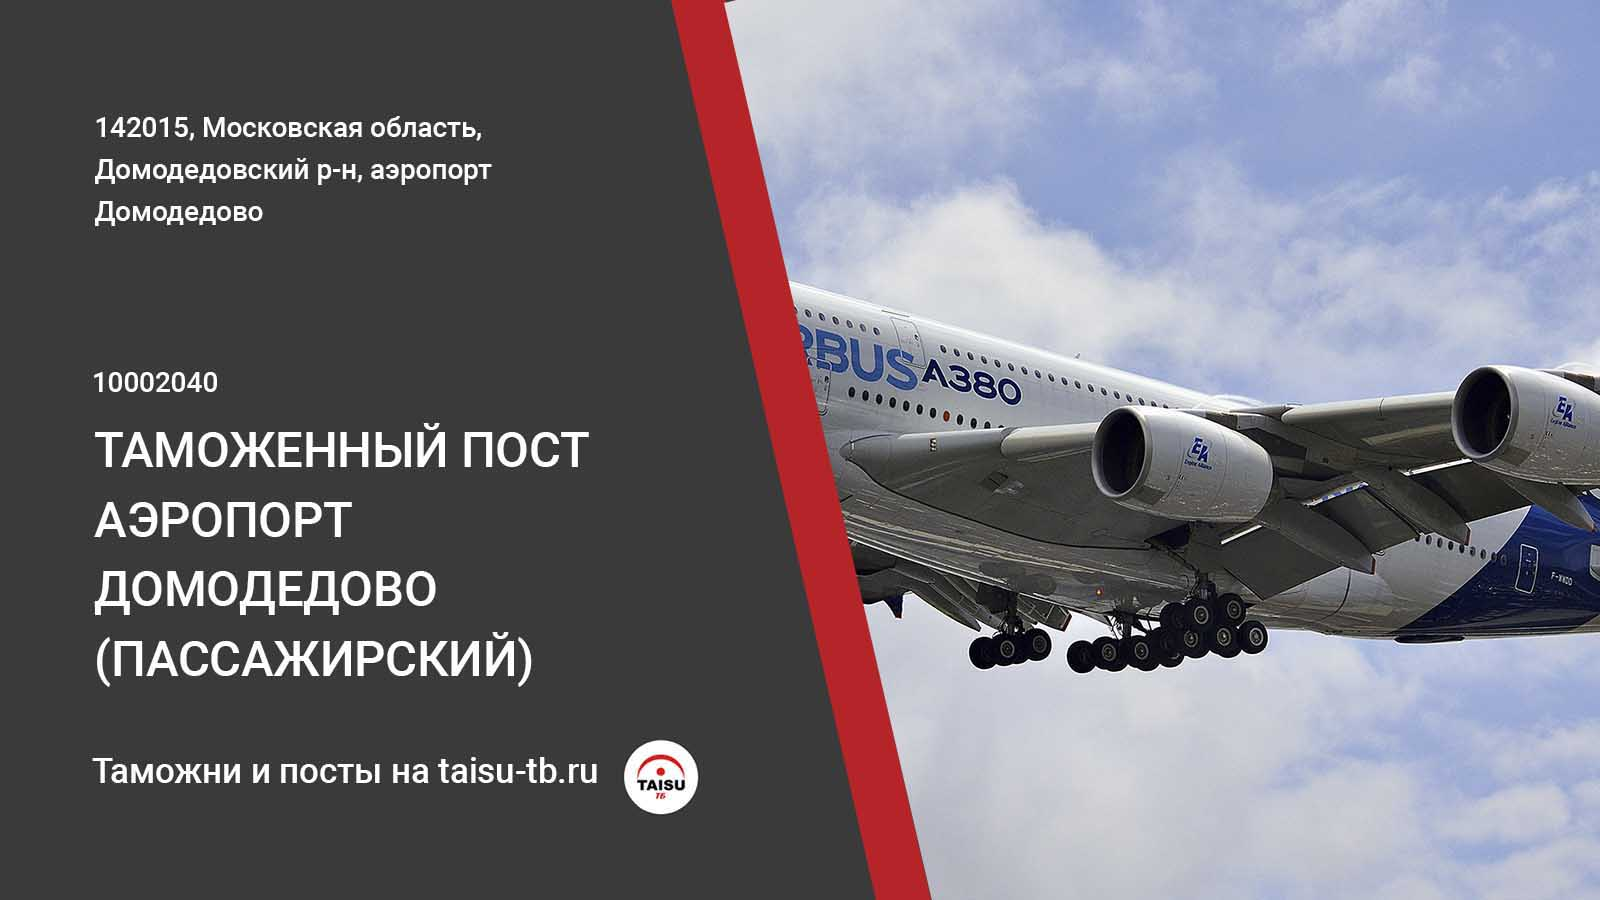 Таможенный пост Аэропорт Домодедово (пассажирский)